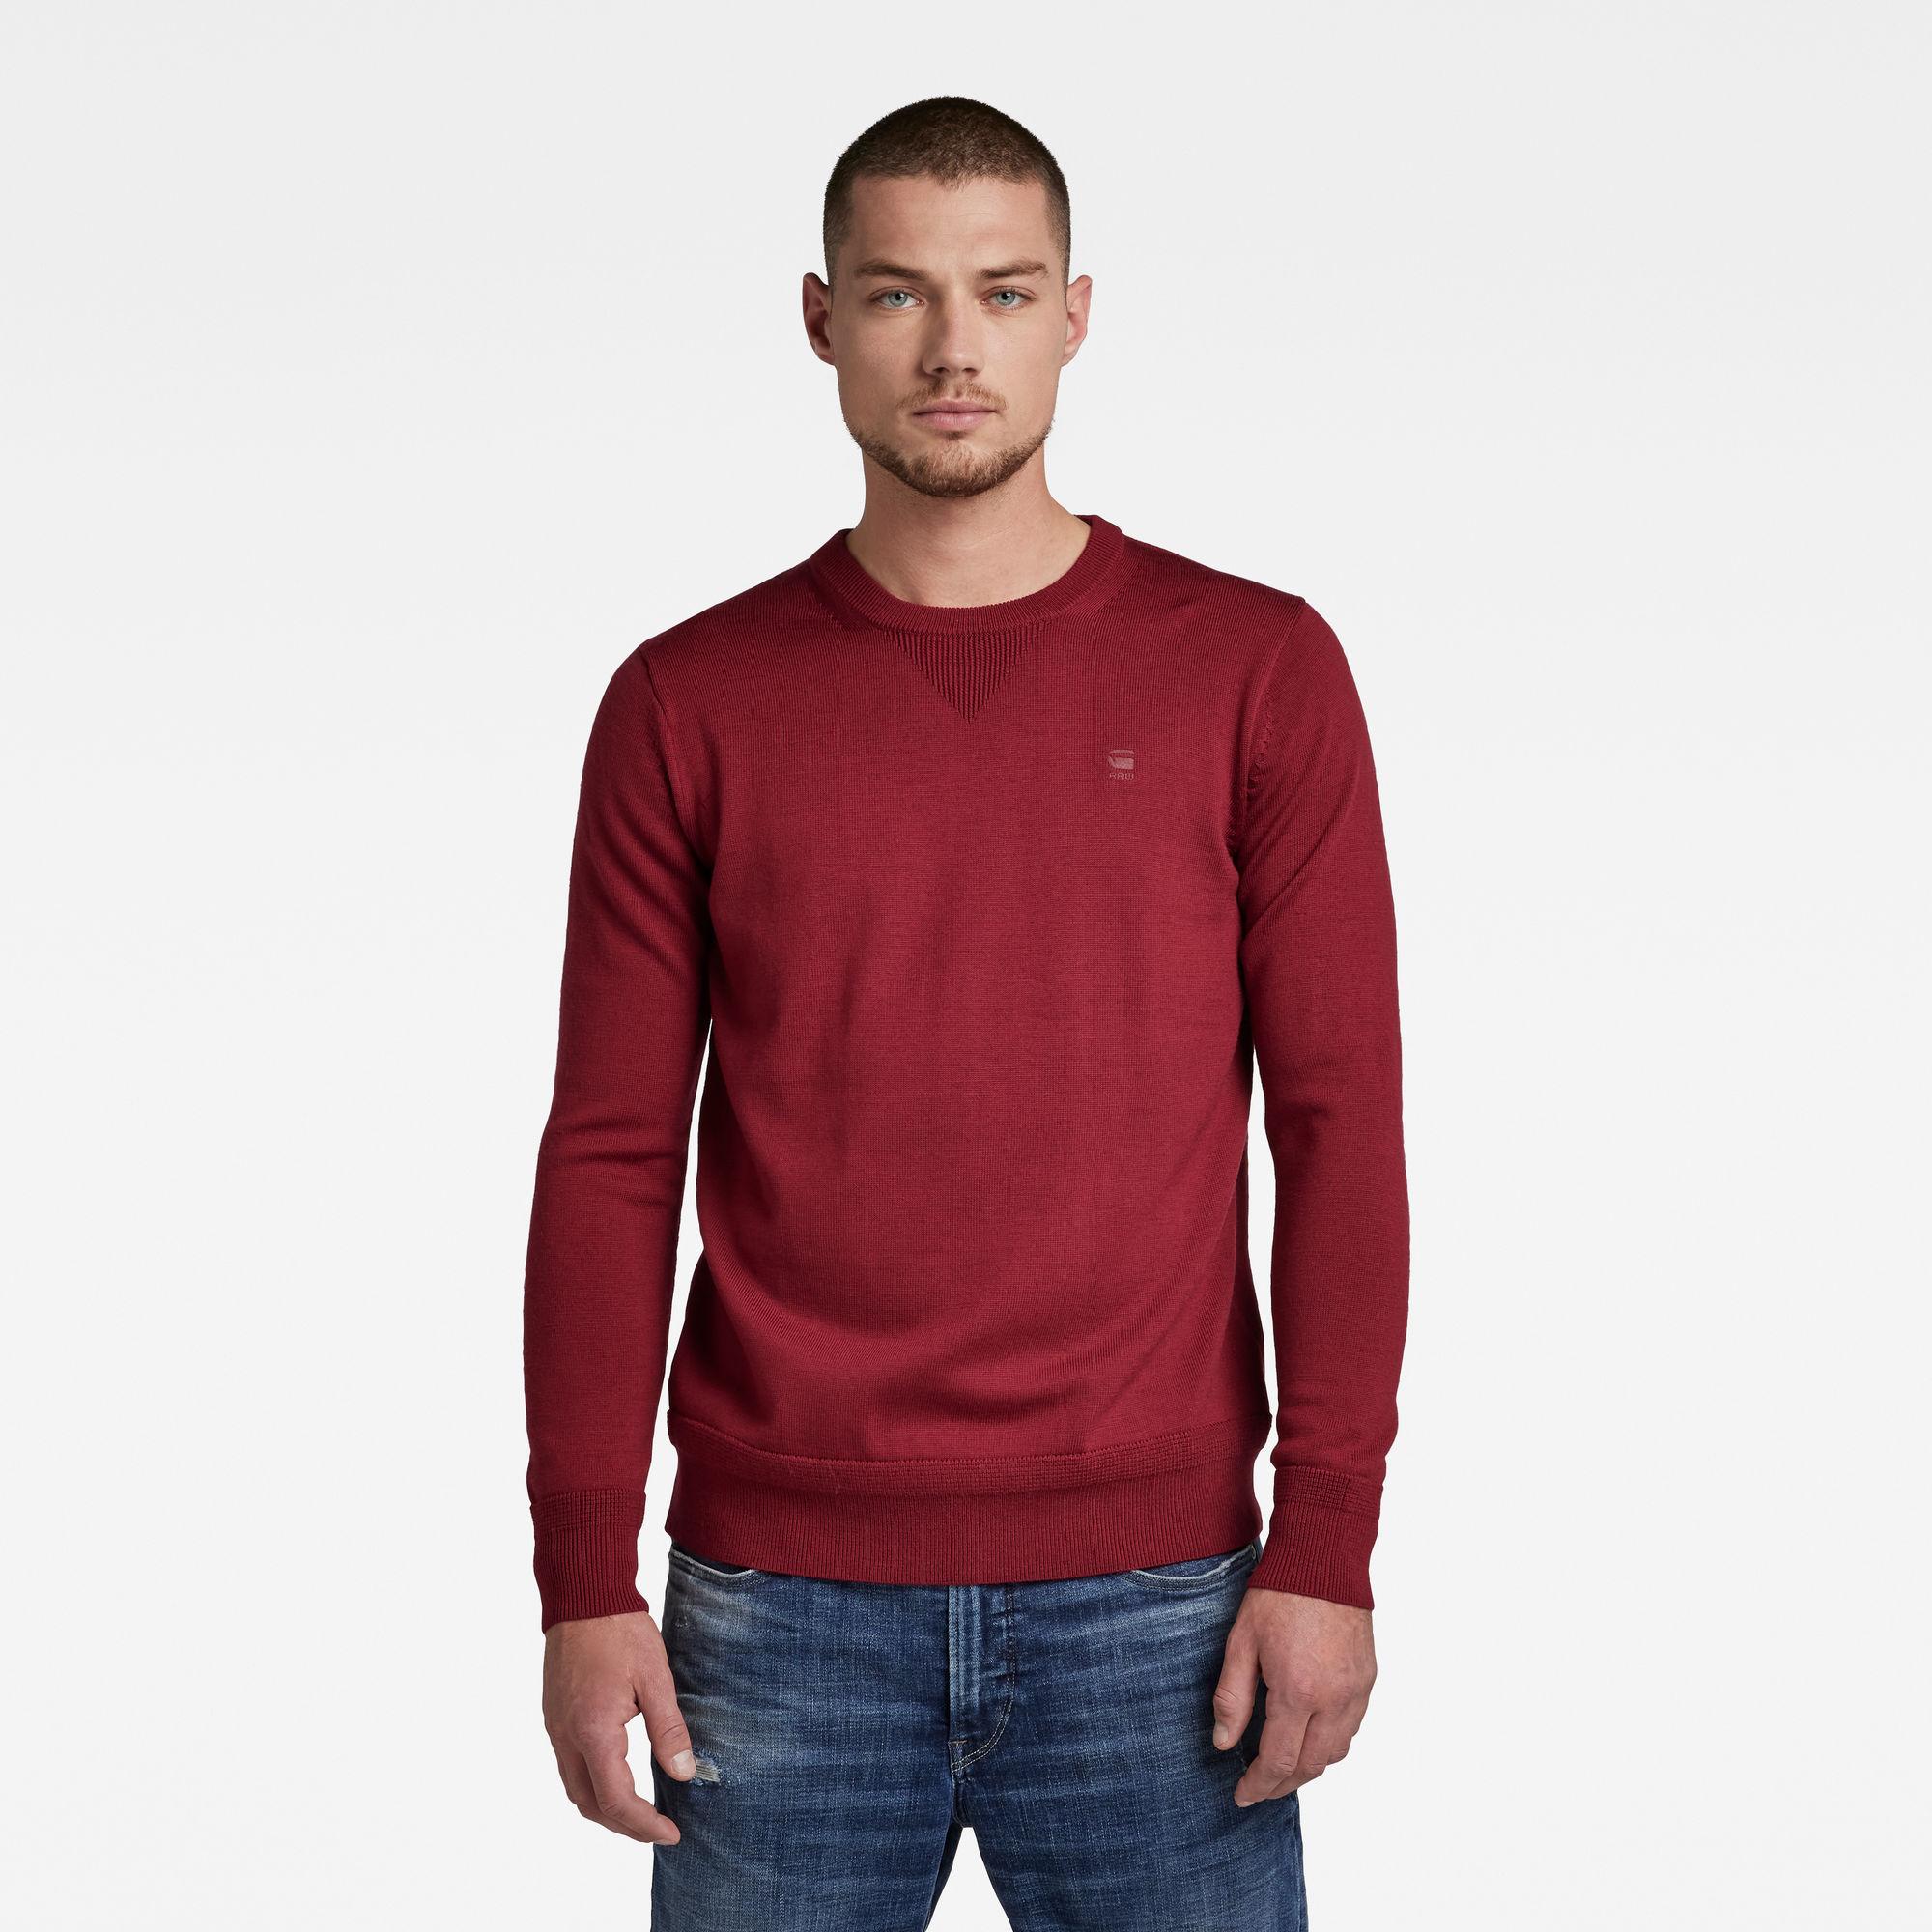 G-Star RAW Heren Premium Basic Knitted sweater Rood